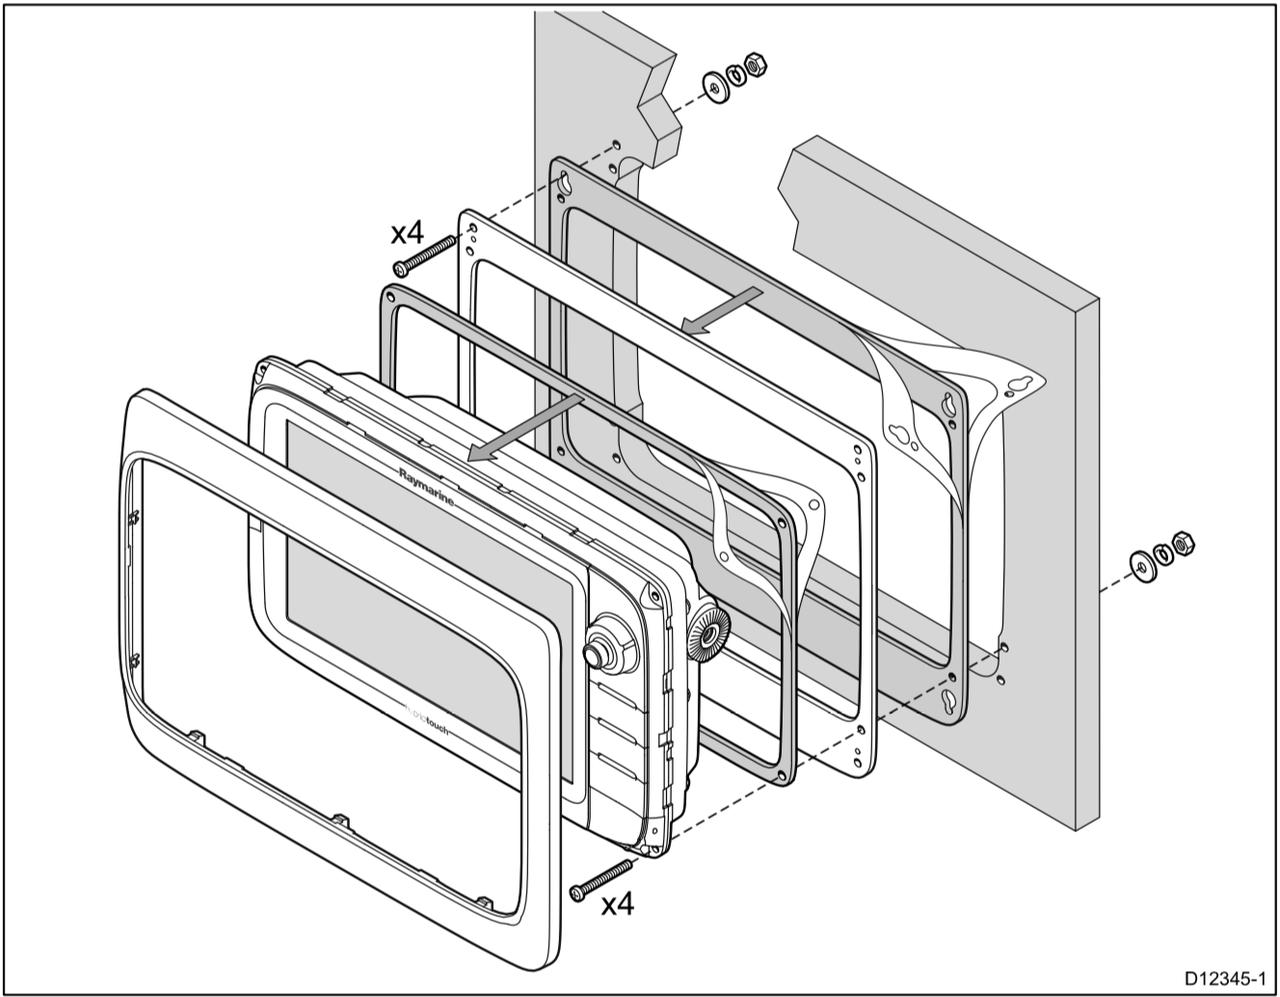 hight resolution of 441s garmin wiring diagram wiring diagram h8 q see wiring diagram 441s garmin wiring diagram